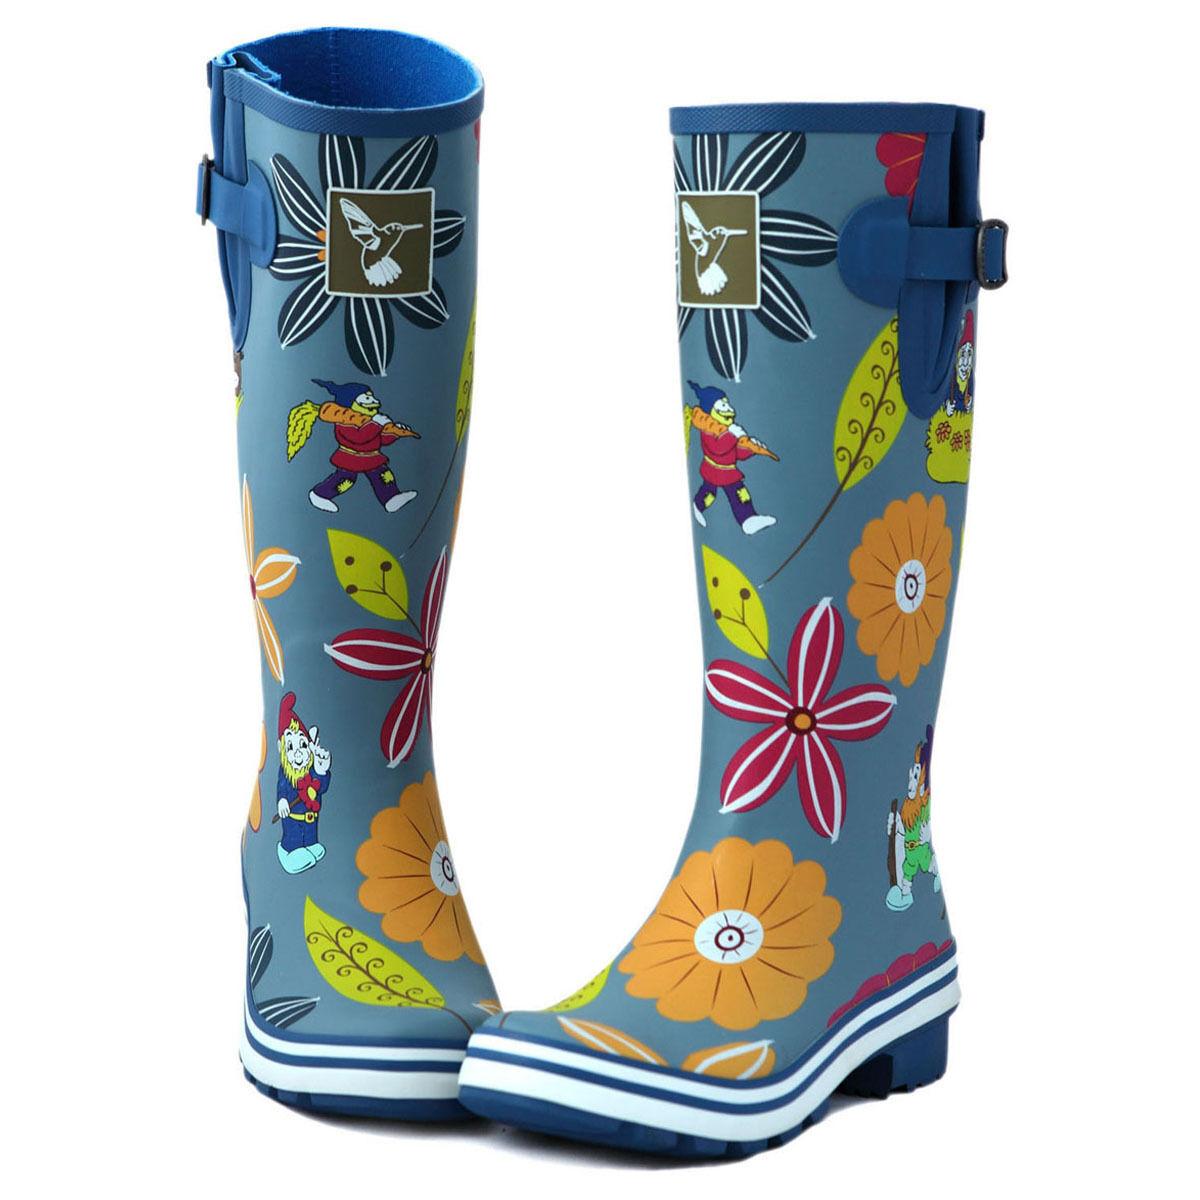 Cute Floral Prints Rain boot Great Quality Knee-high Rain boots Wellies UK Brand